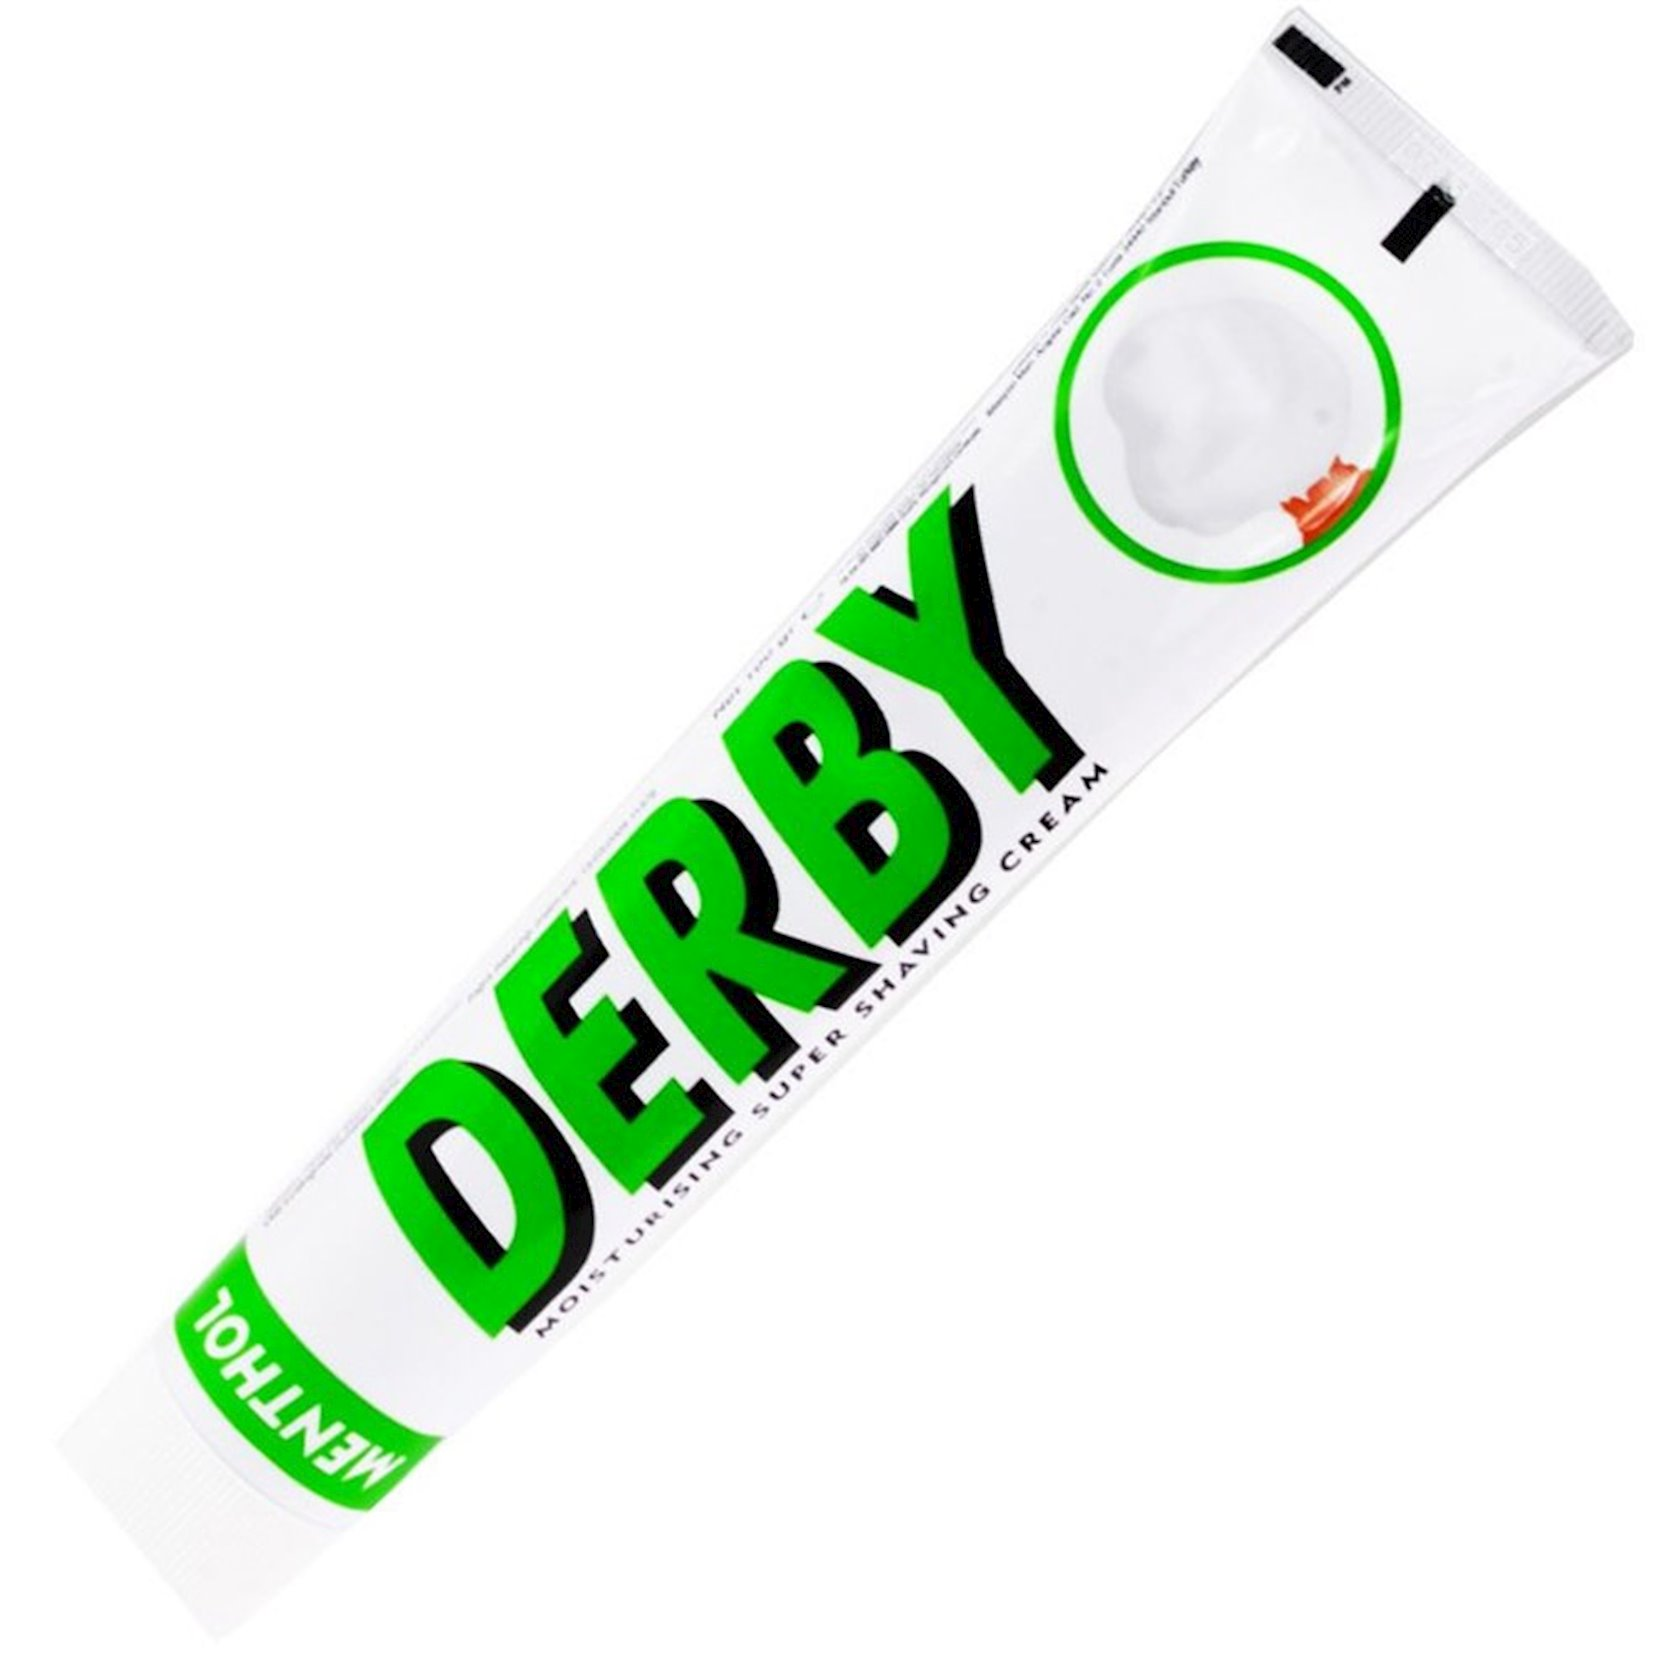 Təraş kremi Derby Mentol, 100ml